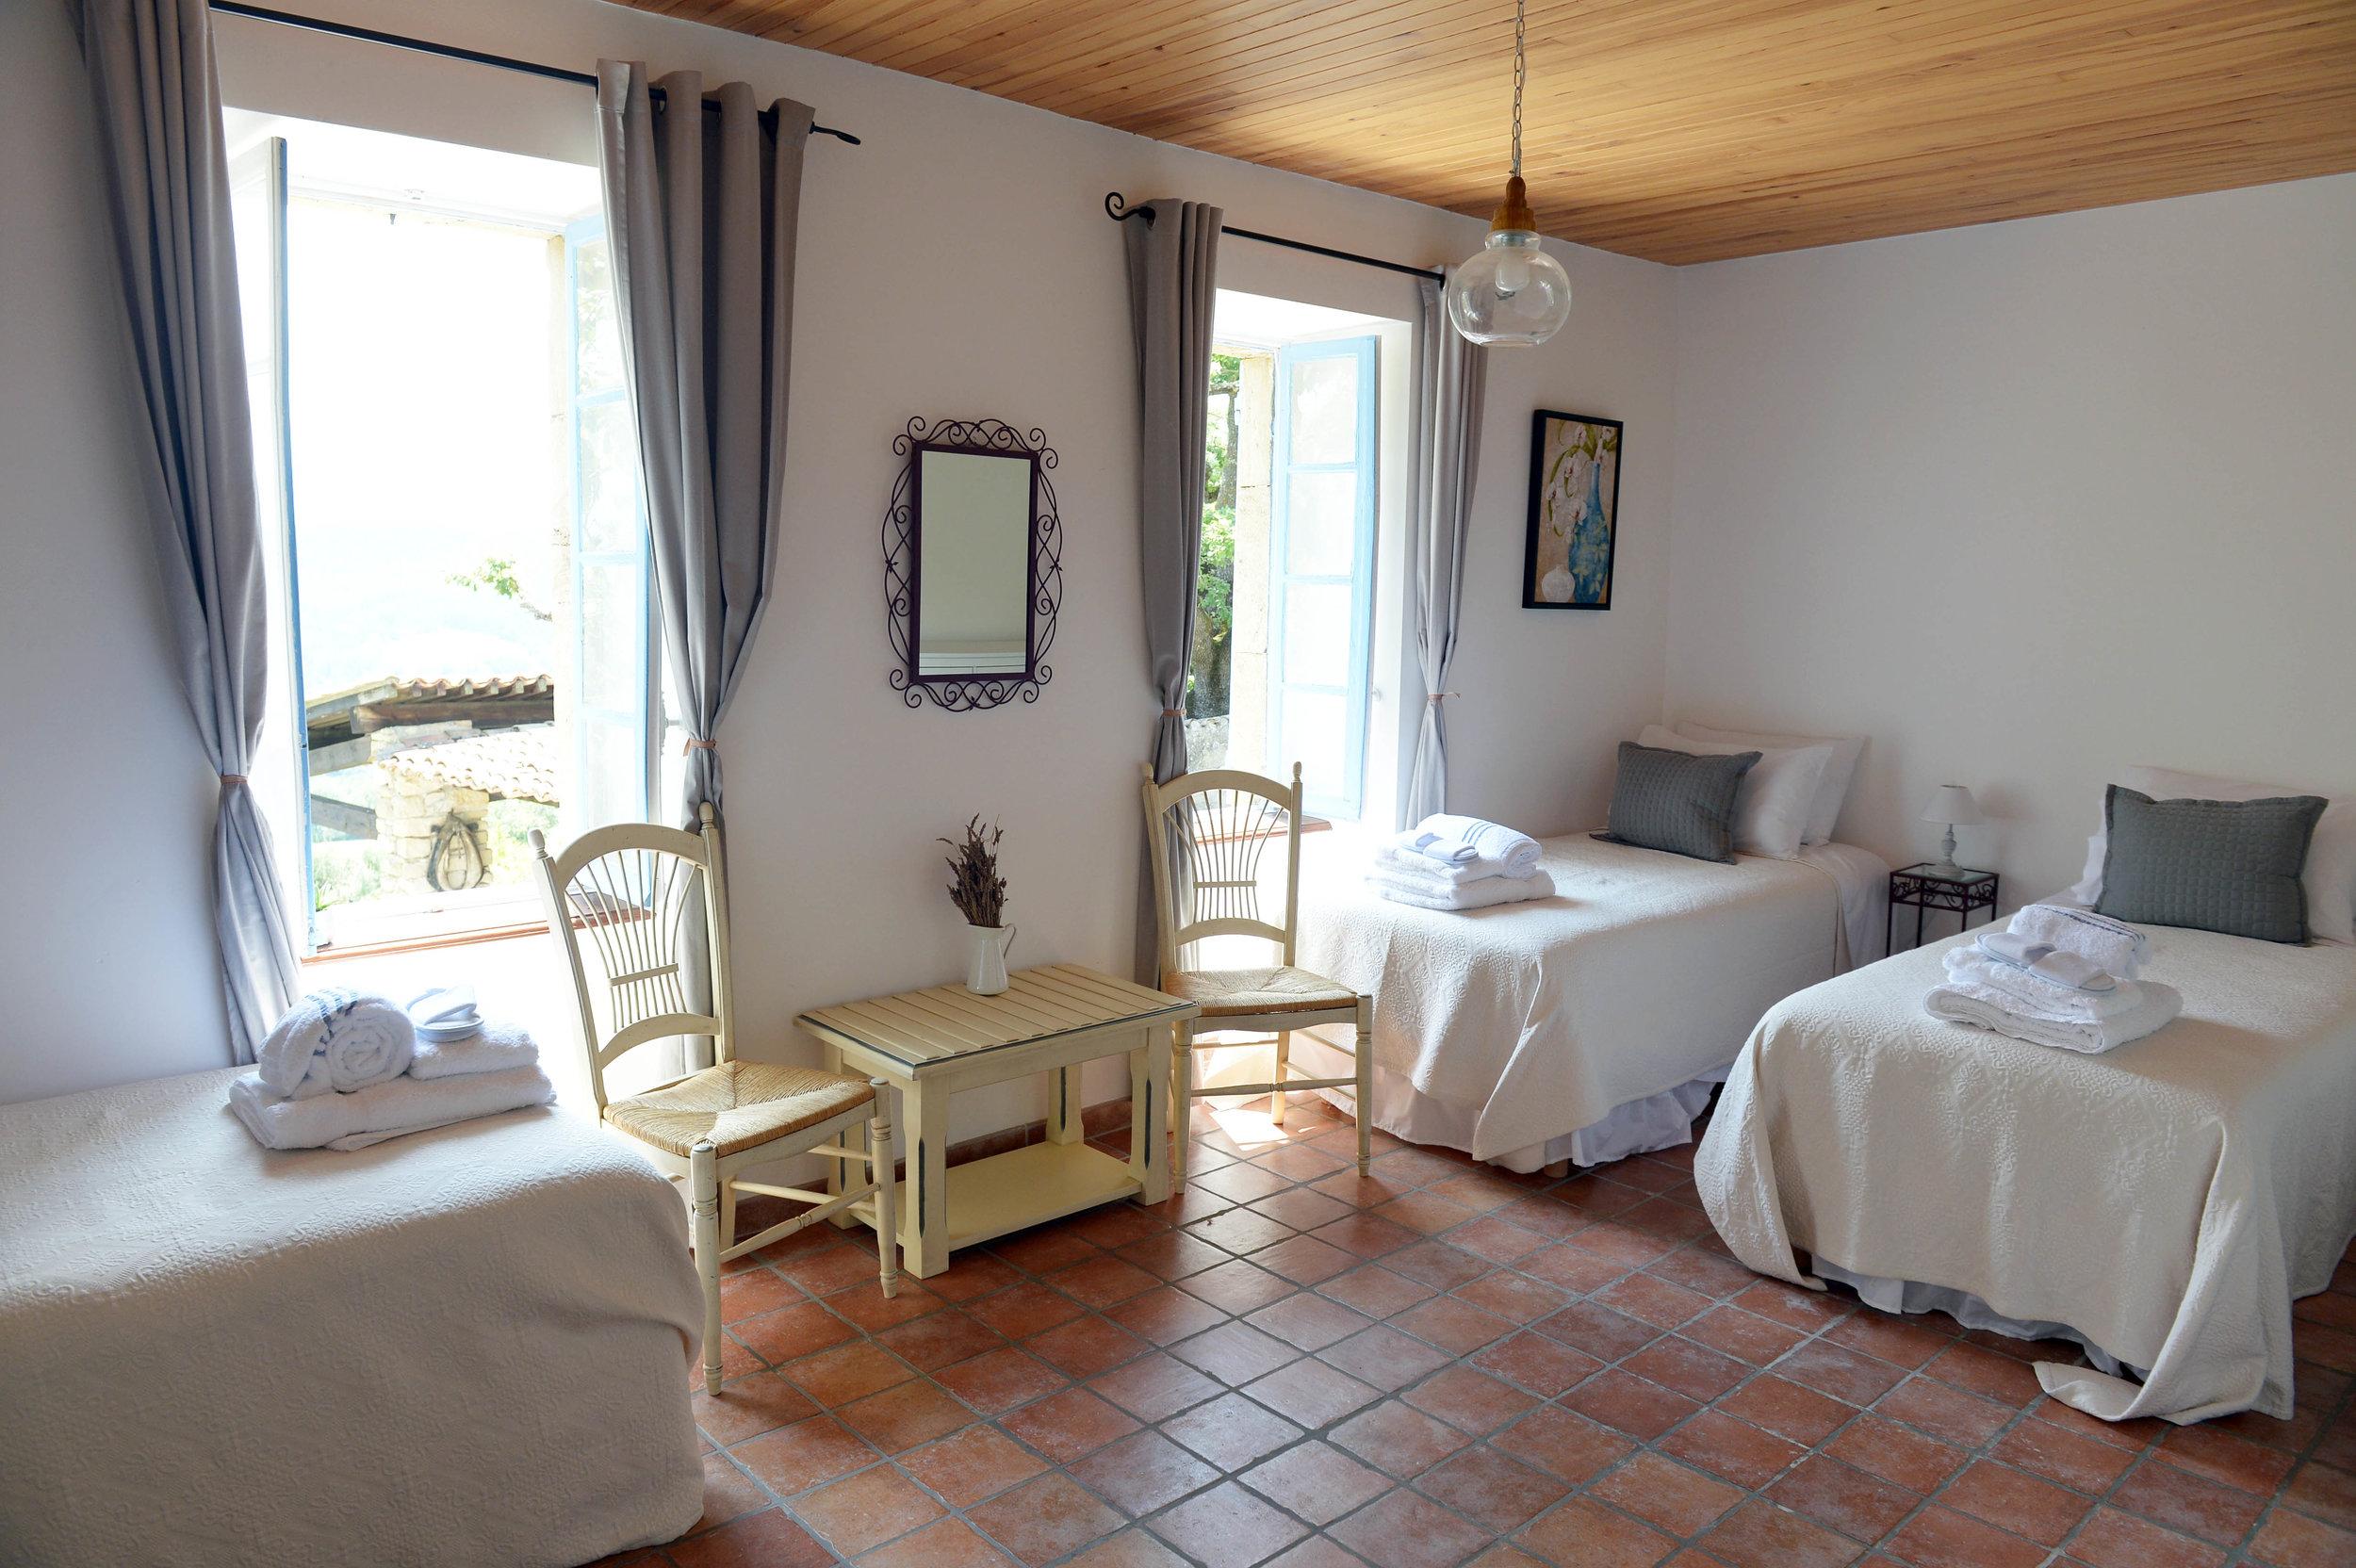 Occitanie 3 beds.JPG